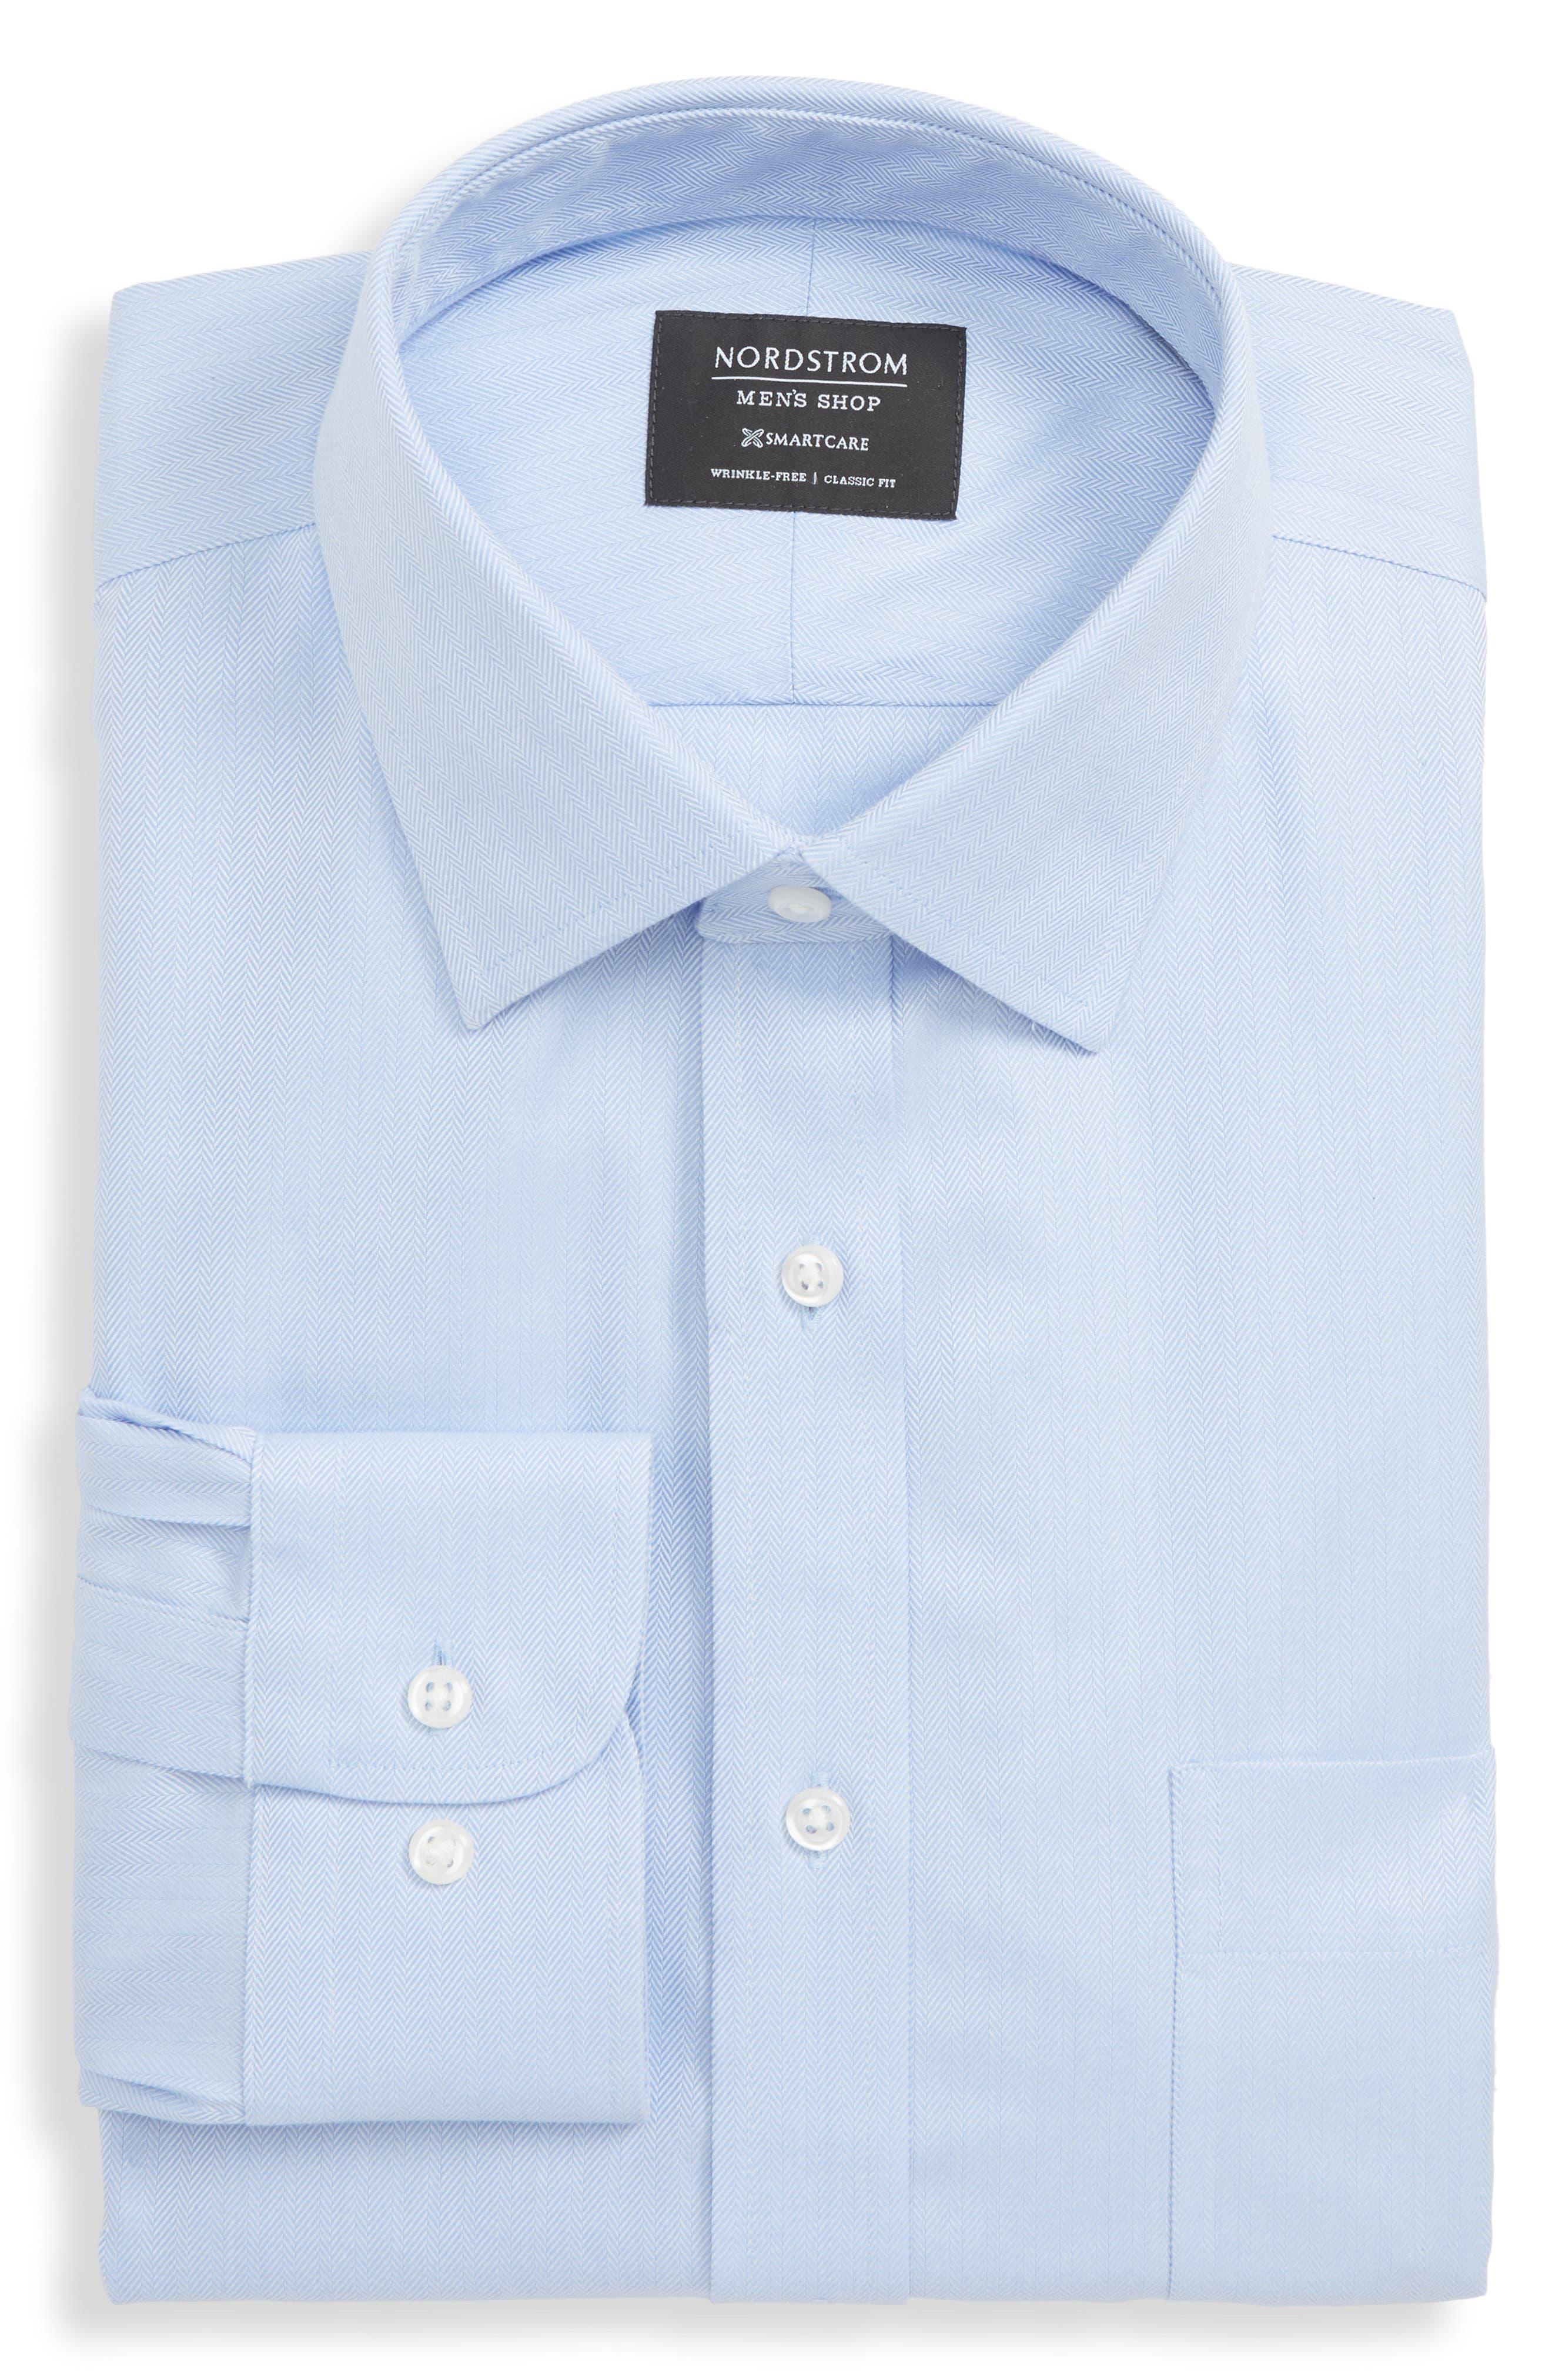 Nordstrom Shop Smartcare(TM) Classic Fit Herringbone Dress Shirt - Blue